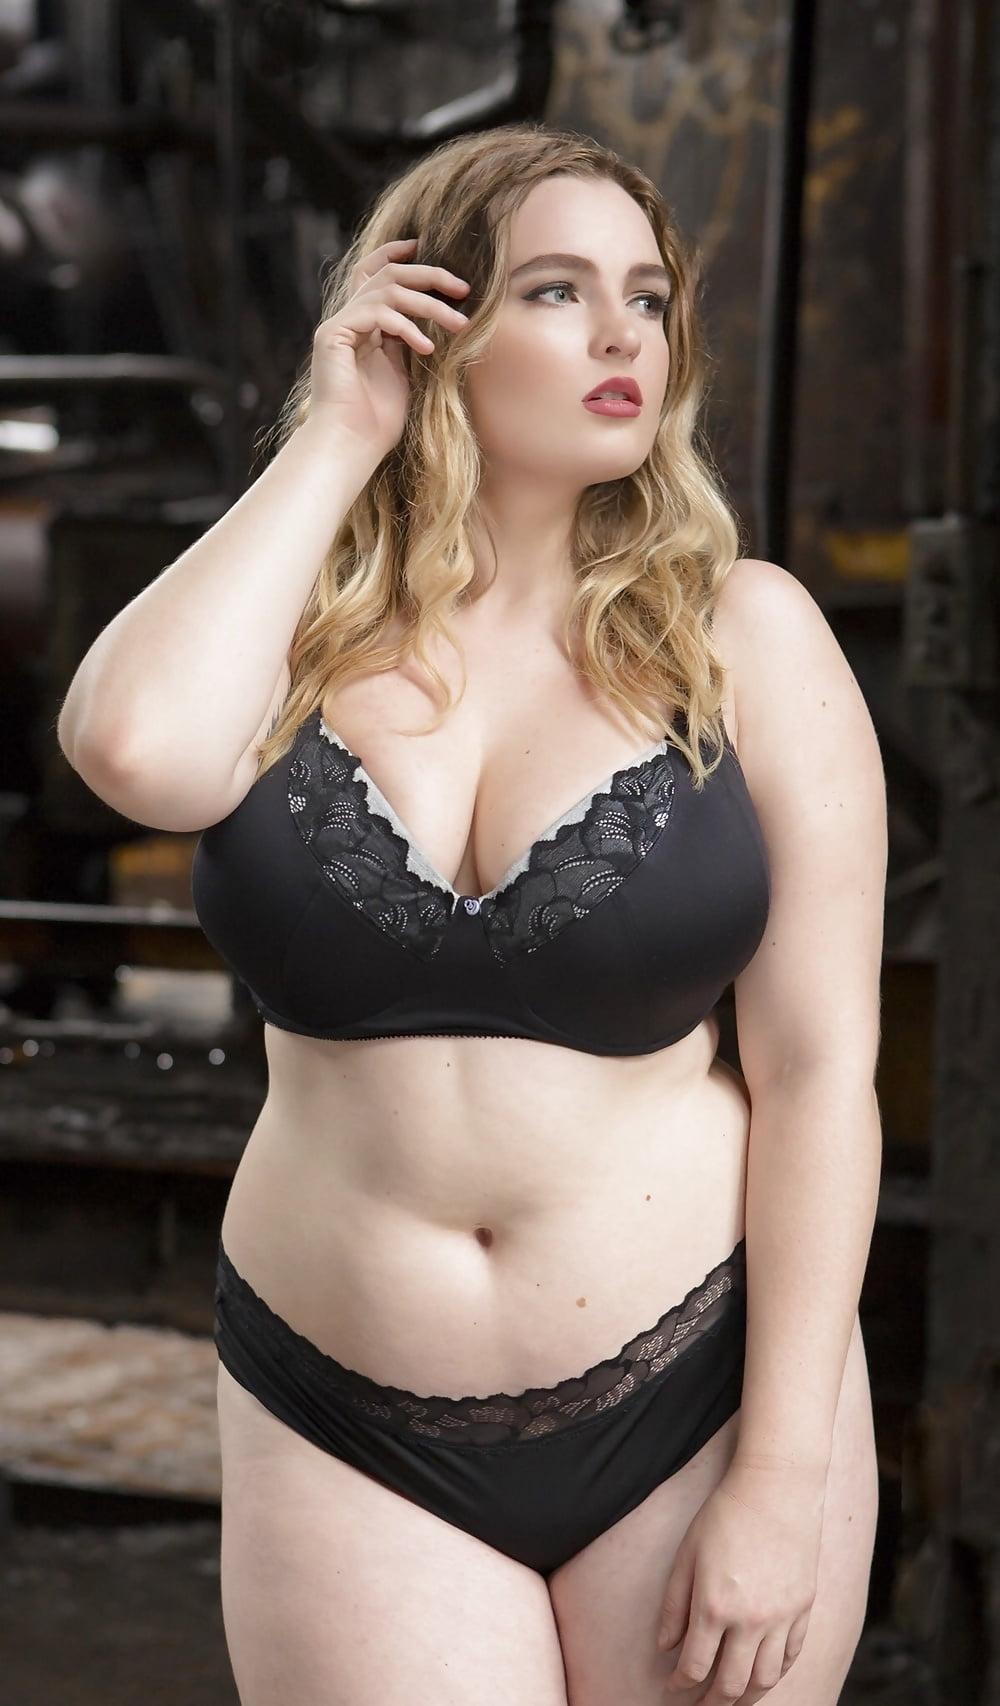 chubby-girl-nude